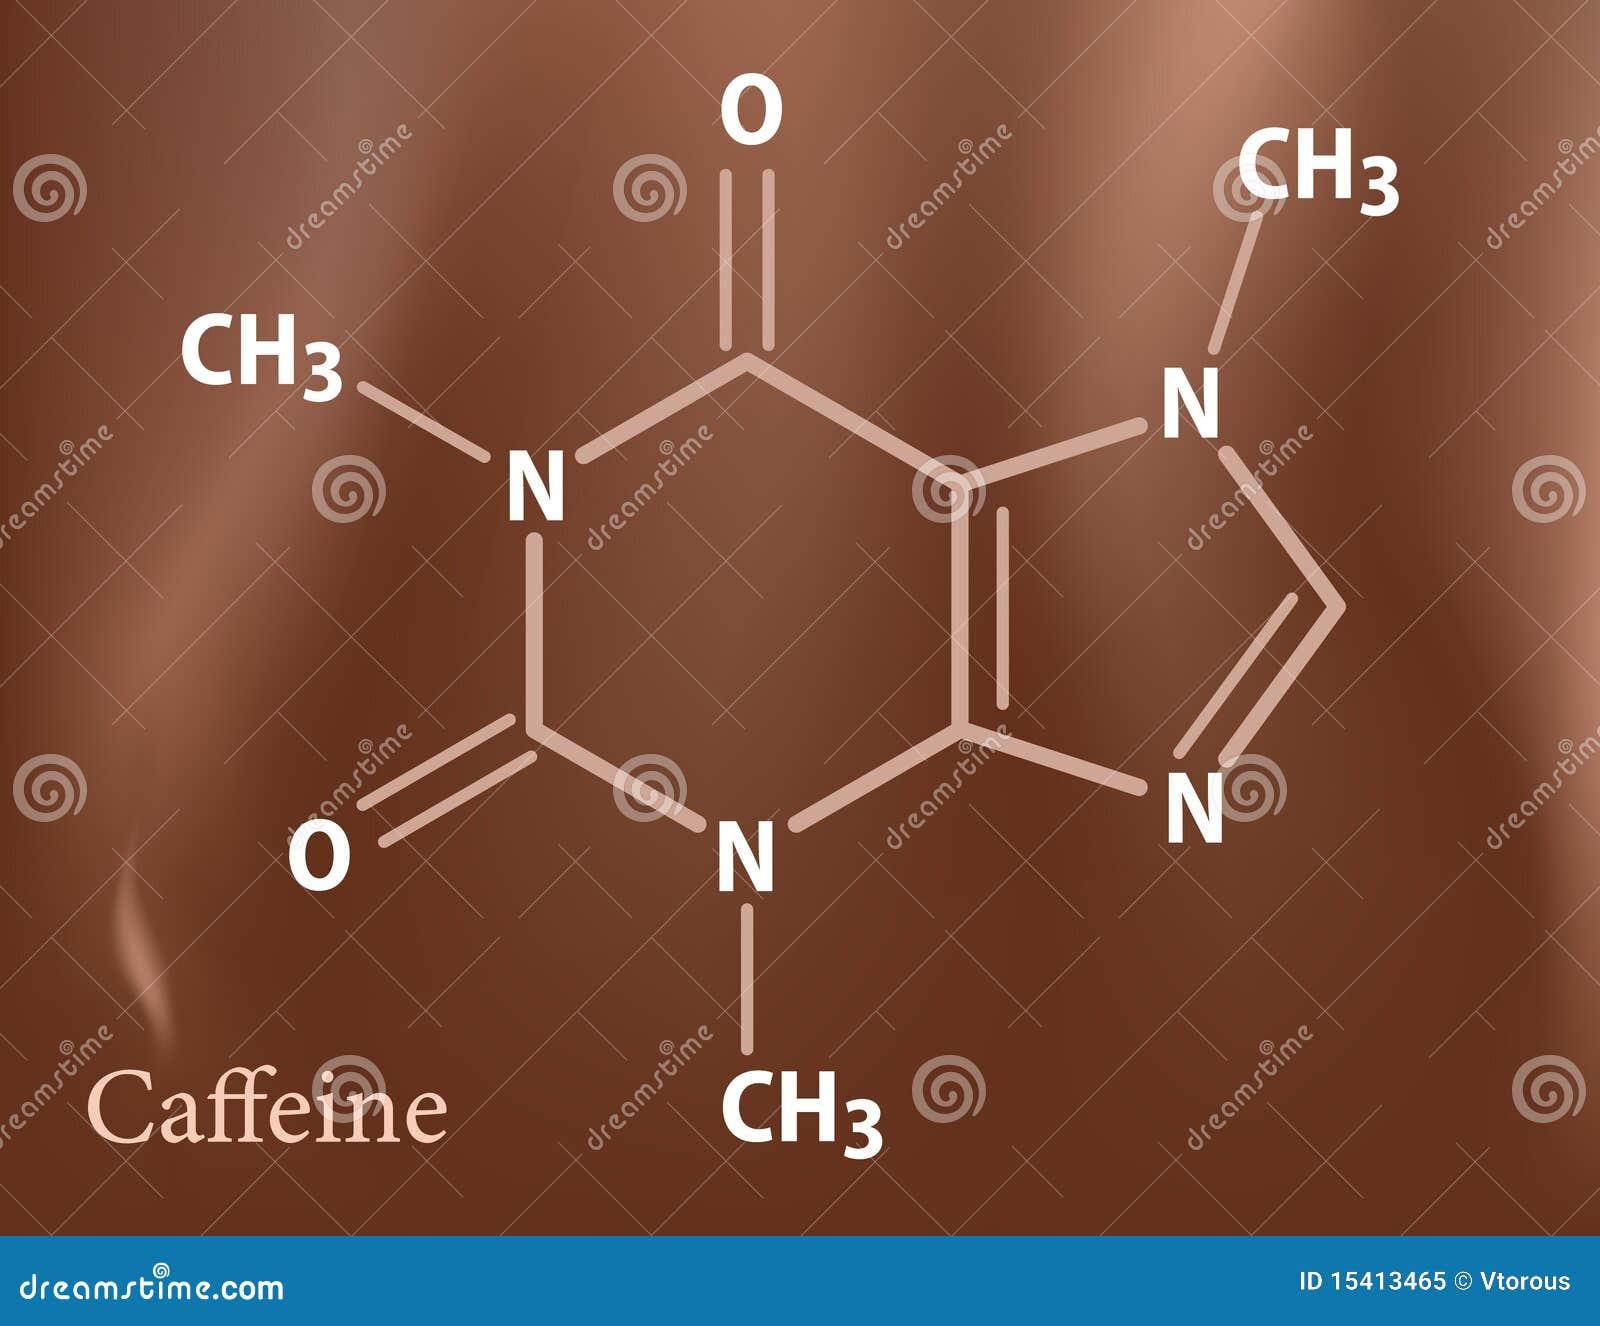 Koffeinformel